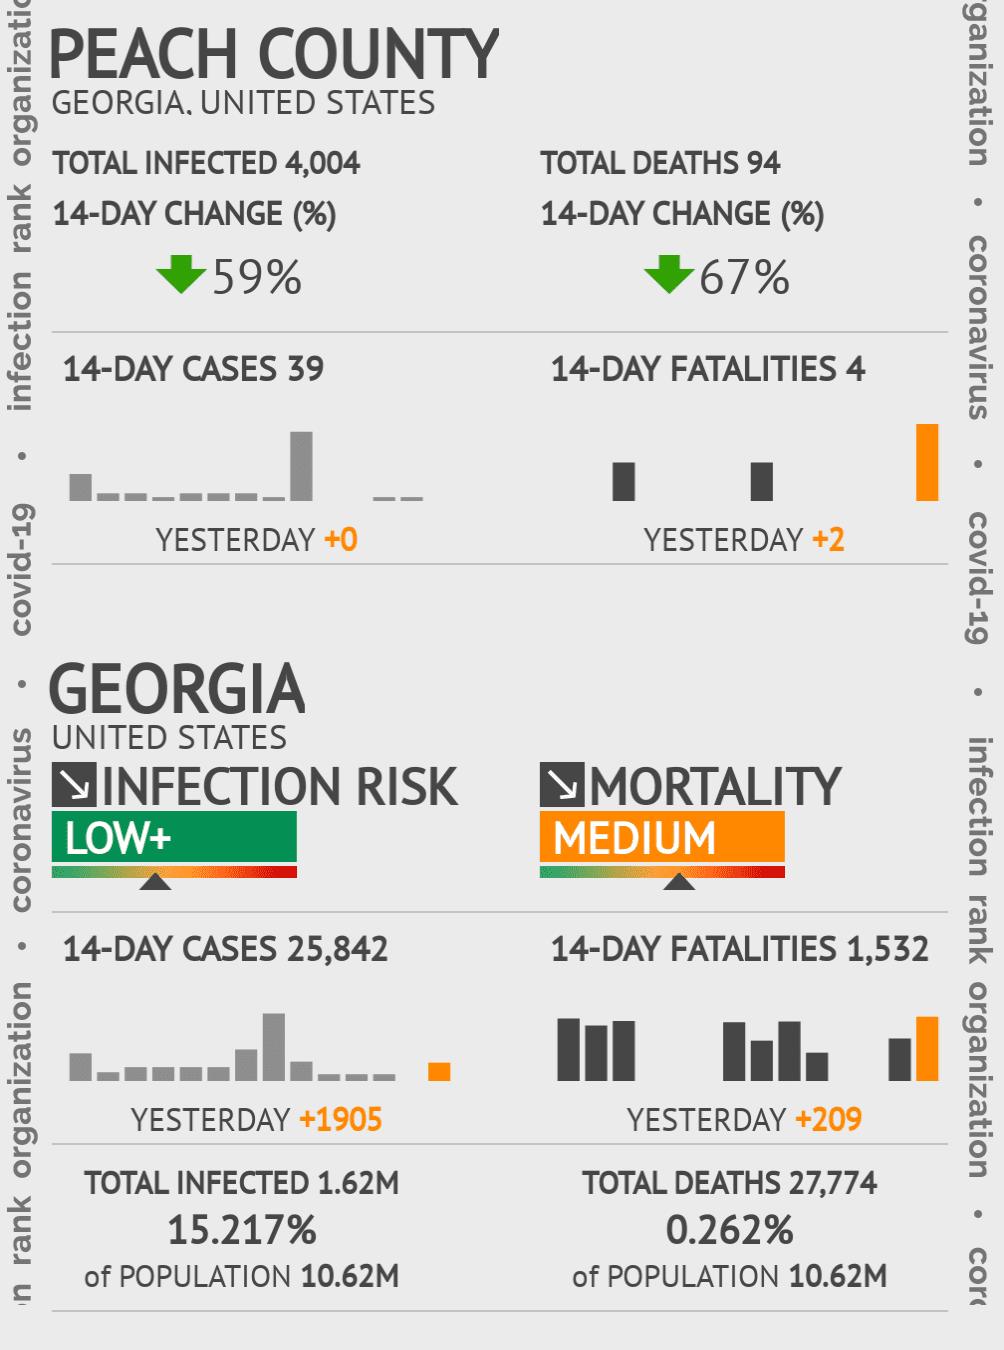 Peach County Coronavirus Covid-19 Risk of Infection on November 29, 2020